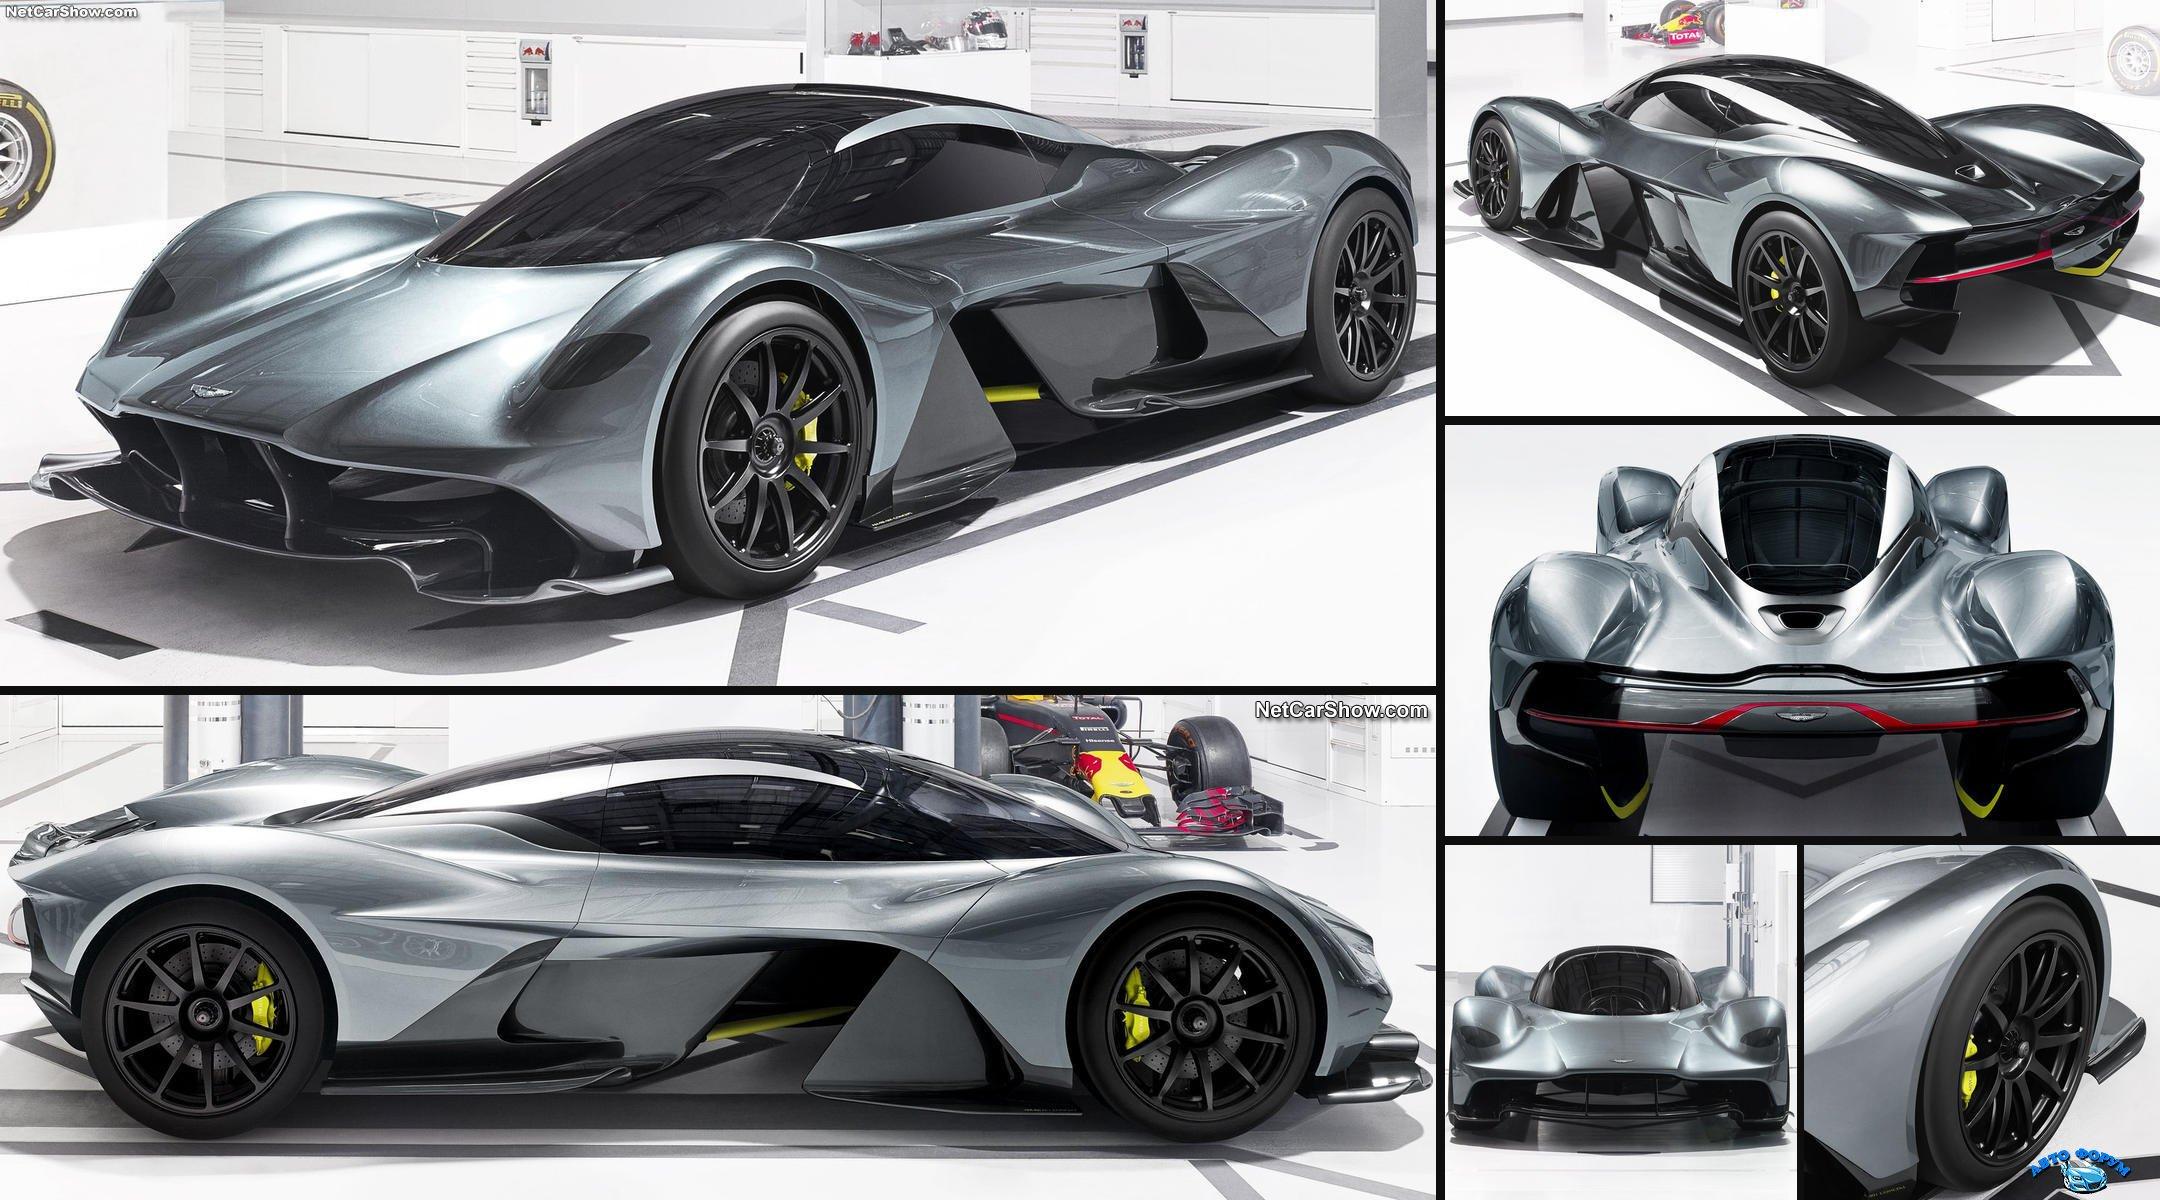 Aston_Martin-AM-RB_001-2018-ig.jpg